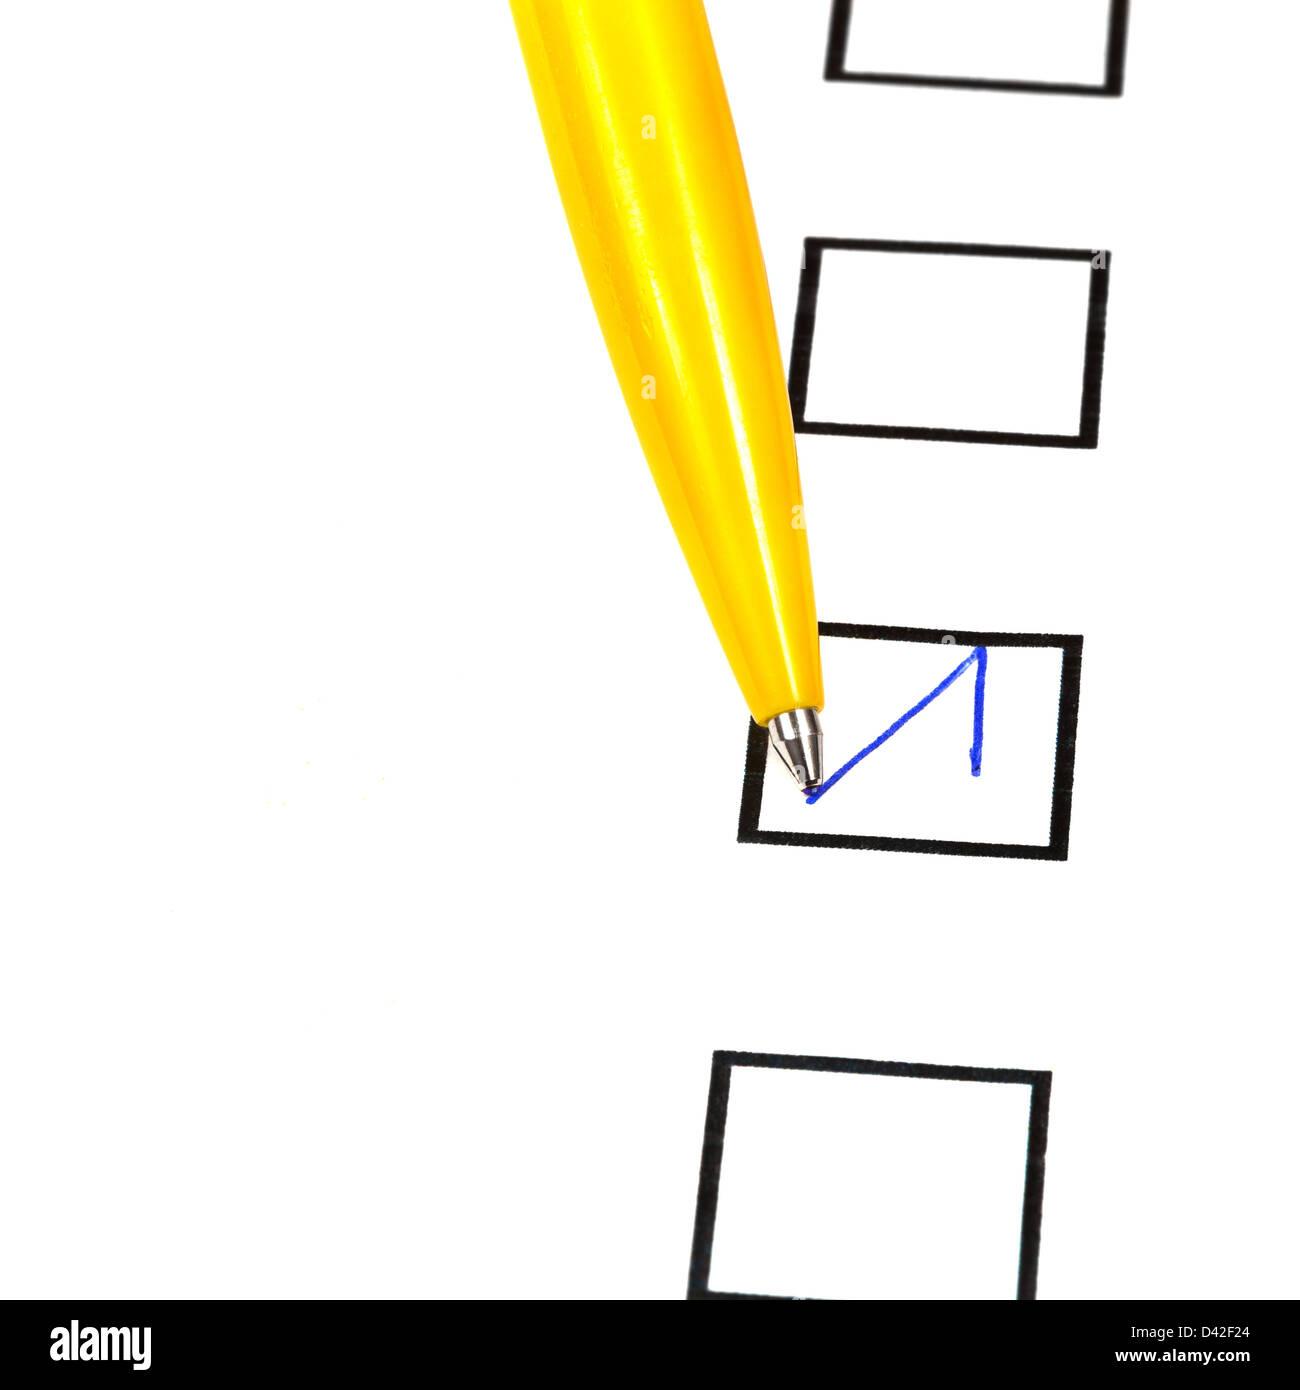 Tick In Black Square Box By Yellow Ballpoint Pen Stock Photo Diagram